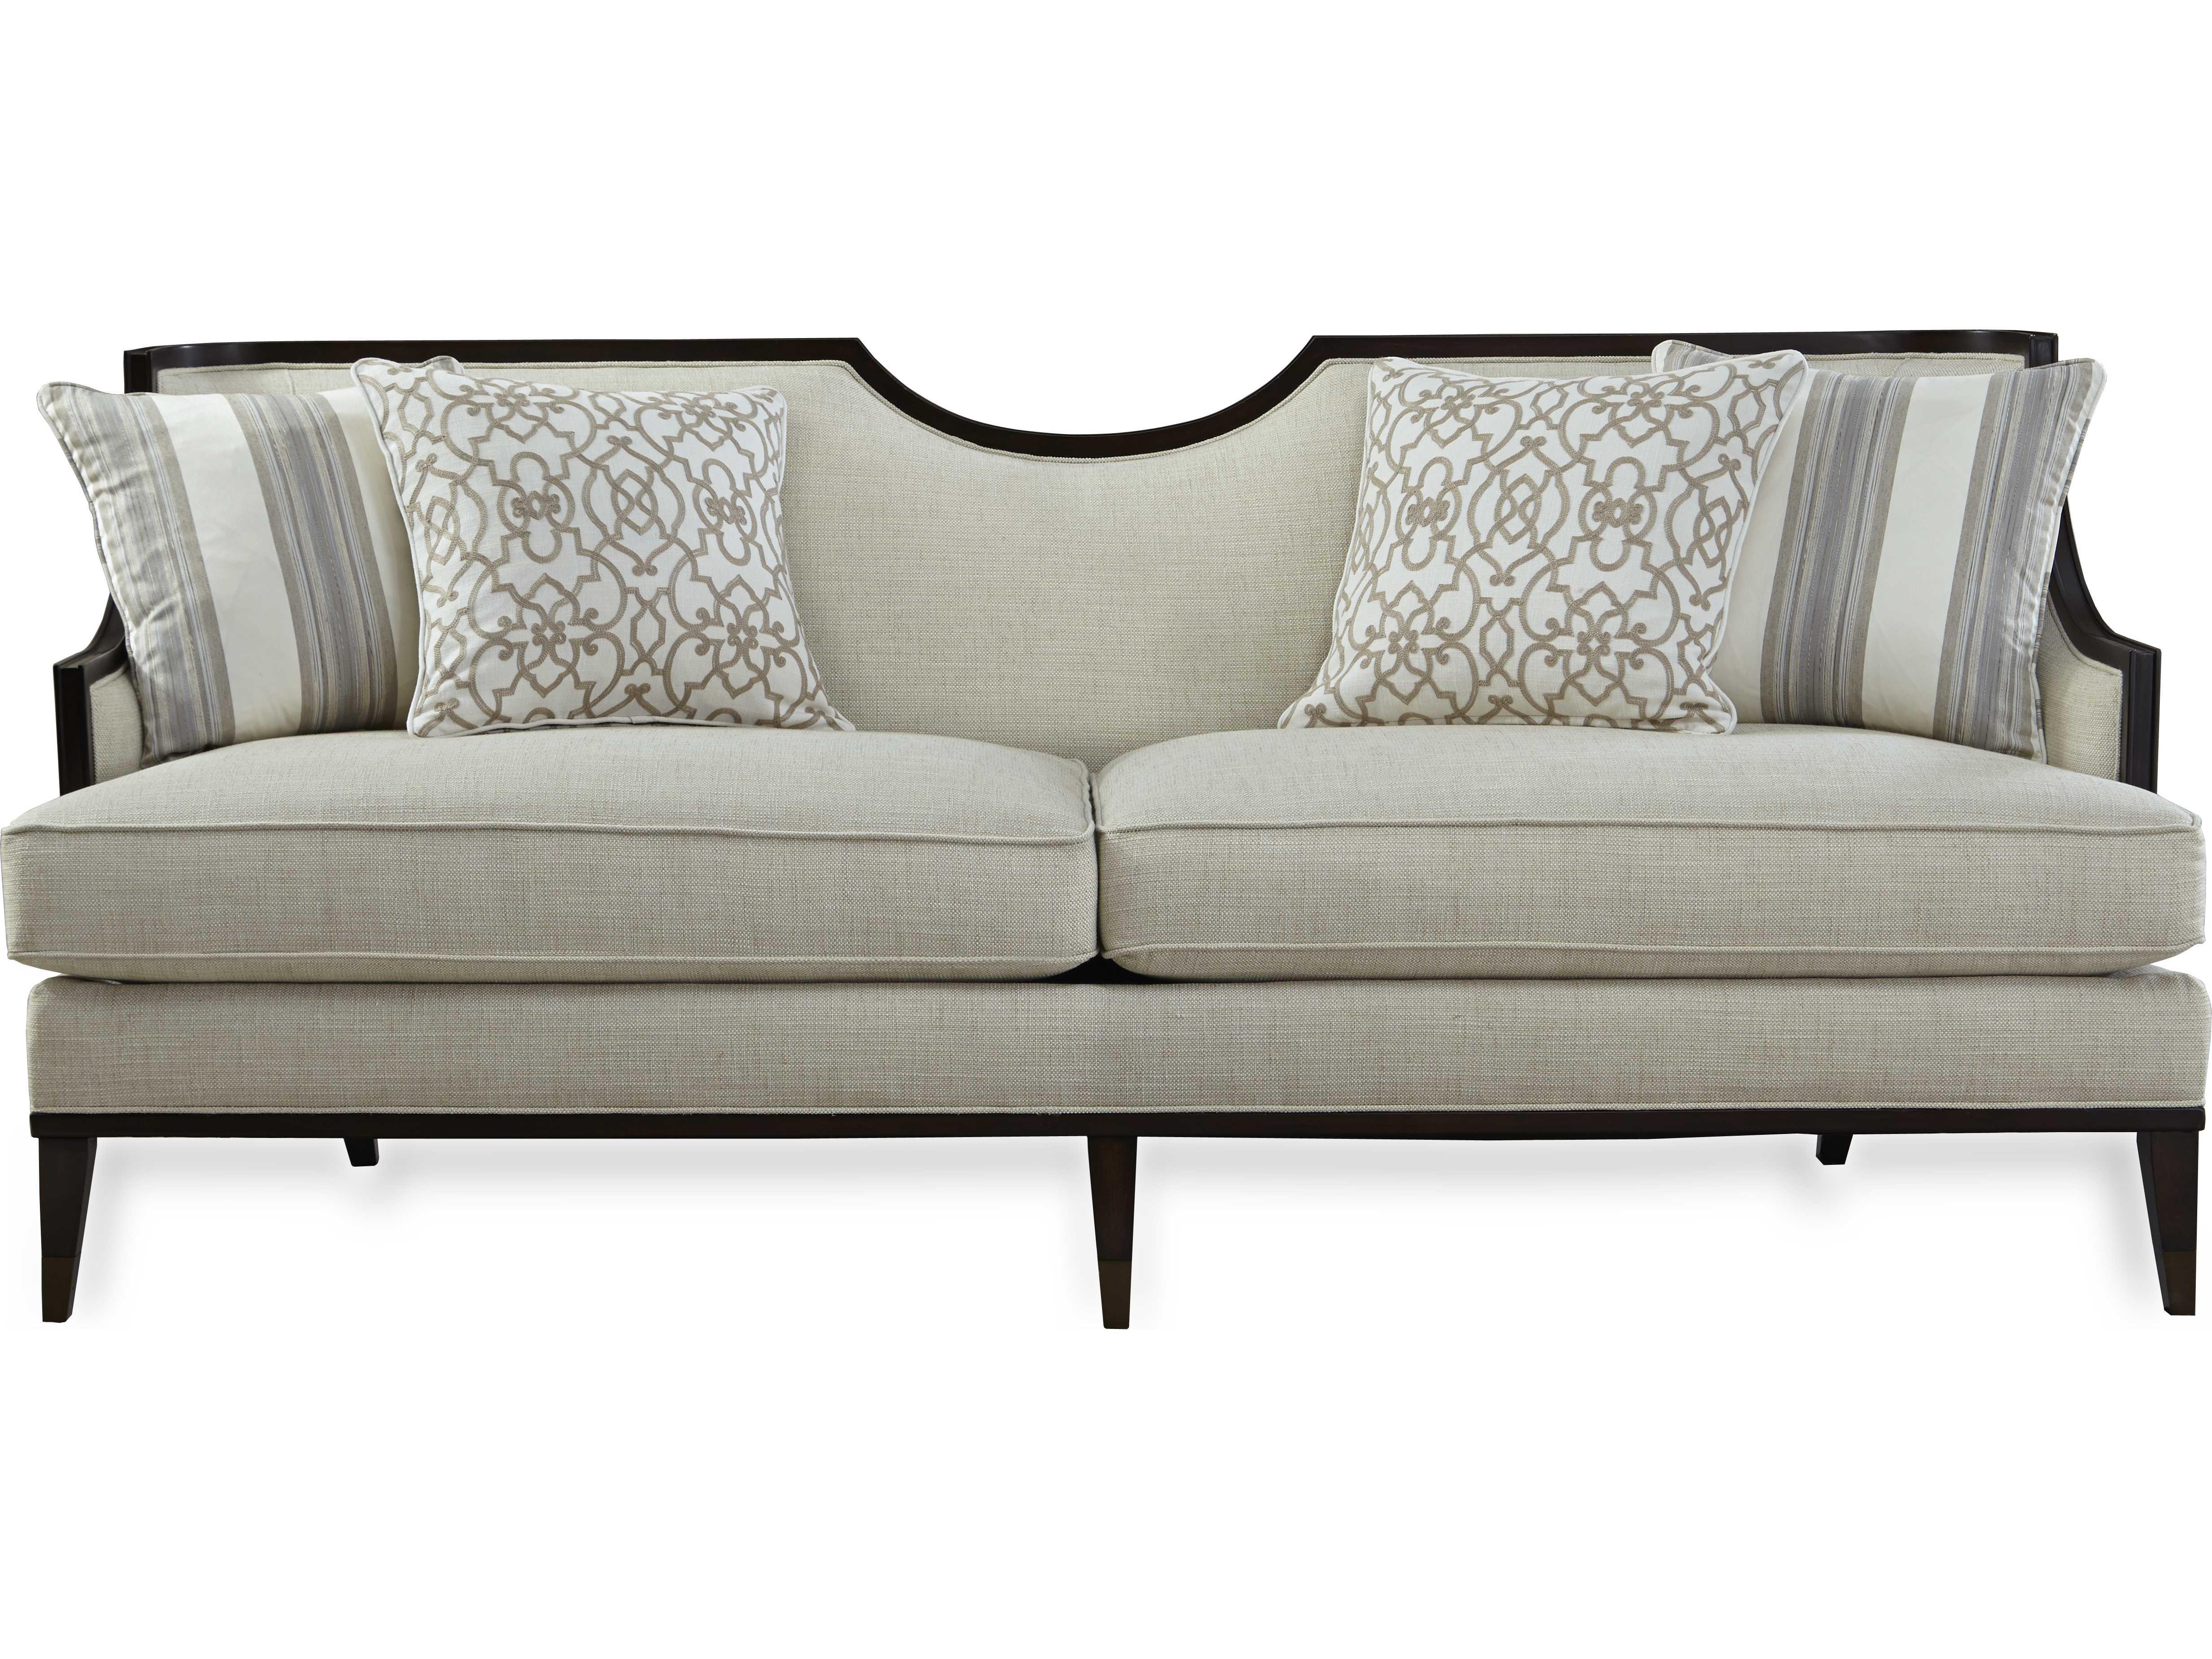 Art Furniture Harper Ivory Mink Sofa At1615015336aa